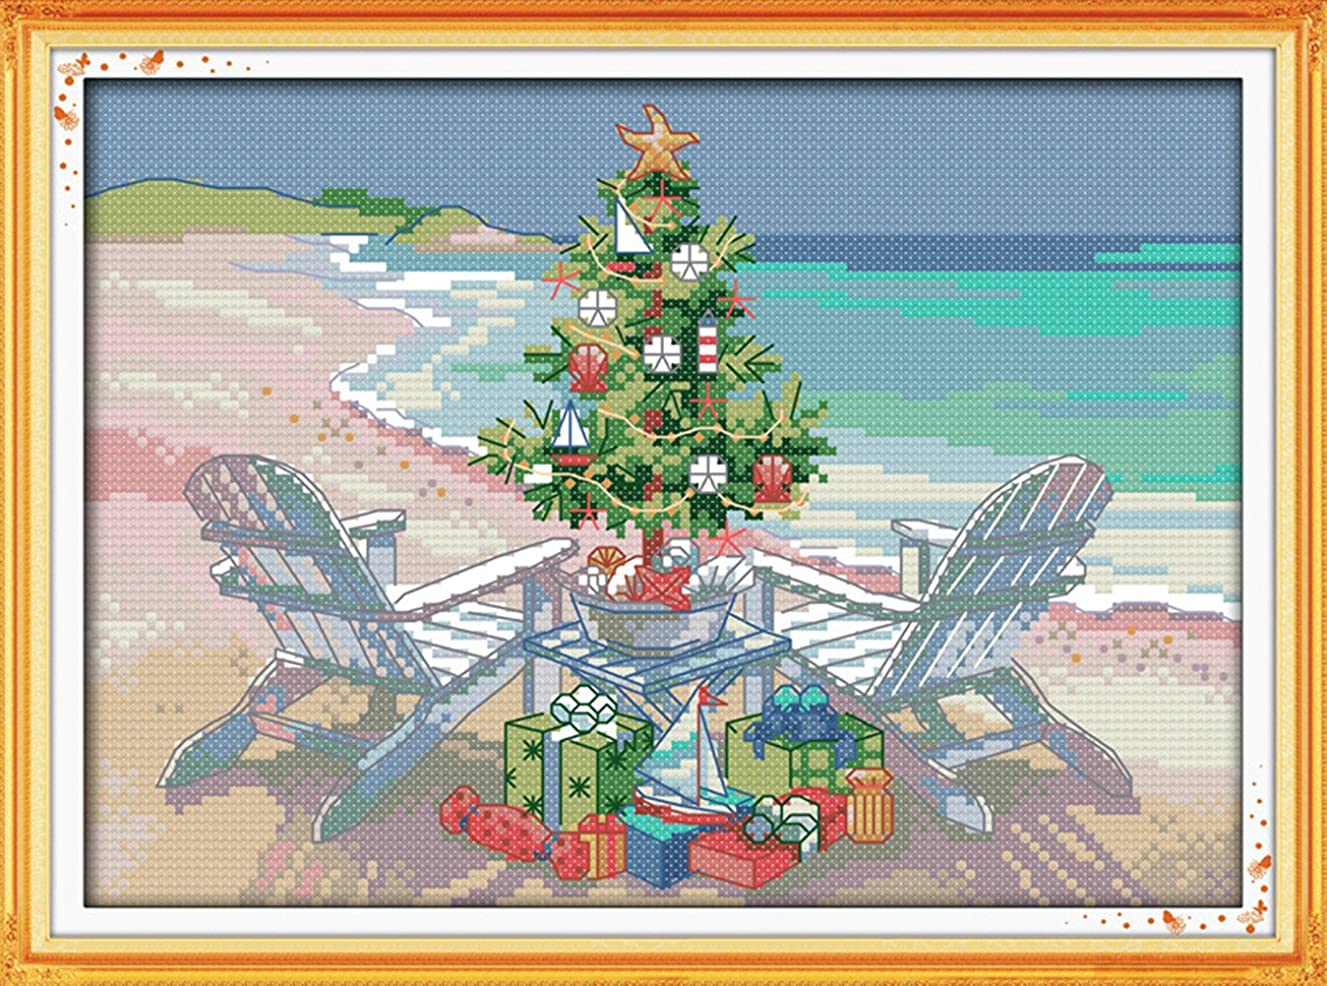 YEESAM ART New Cross Stitch Kits Advanced Patterns for Beginners Kids Adults - Christmas Tree 11 CT Stamped 38×27 cm - DIY Needlework Wedding Christmas Gifts